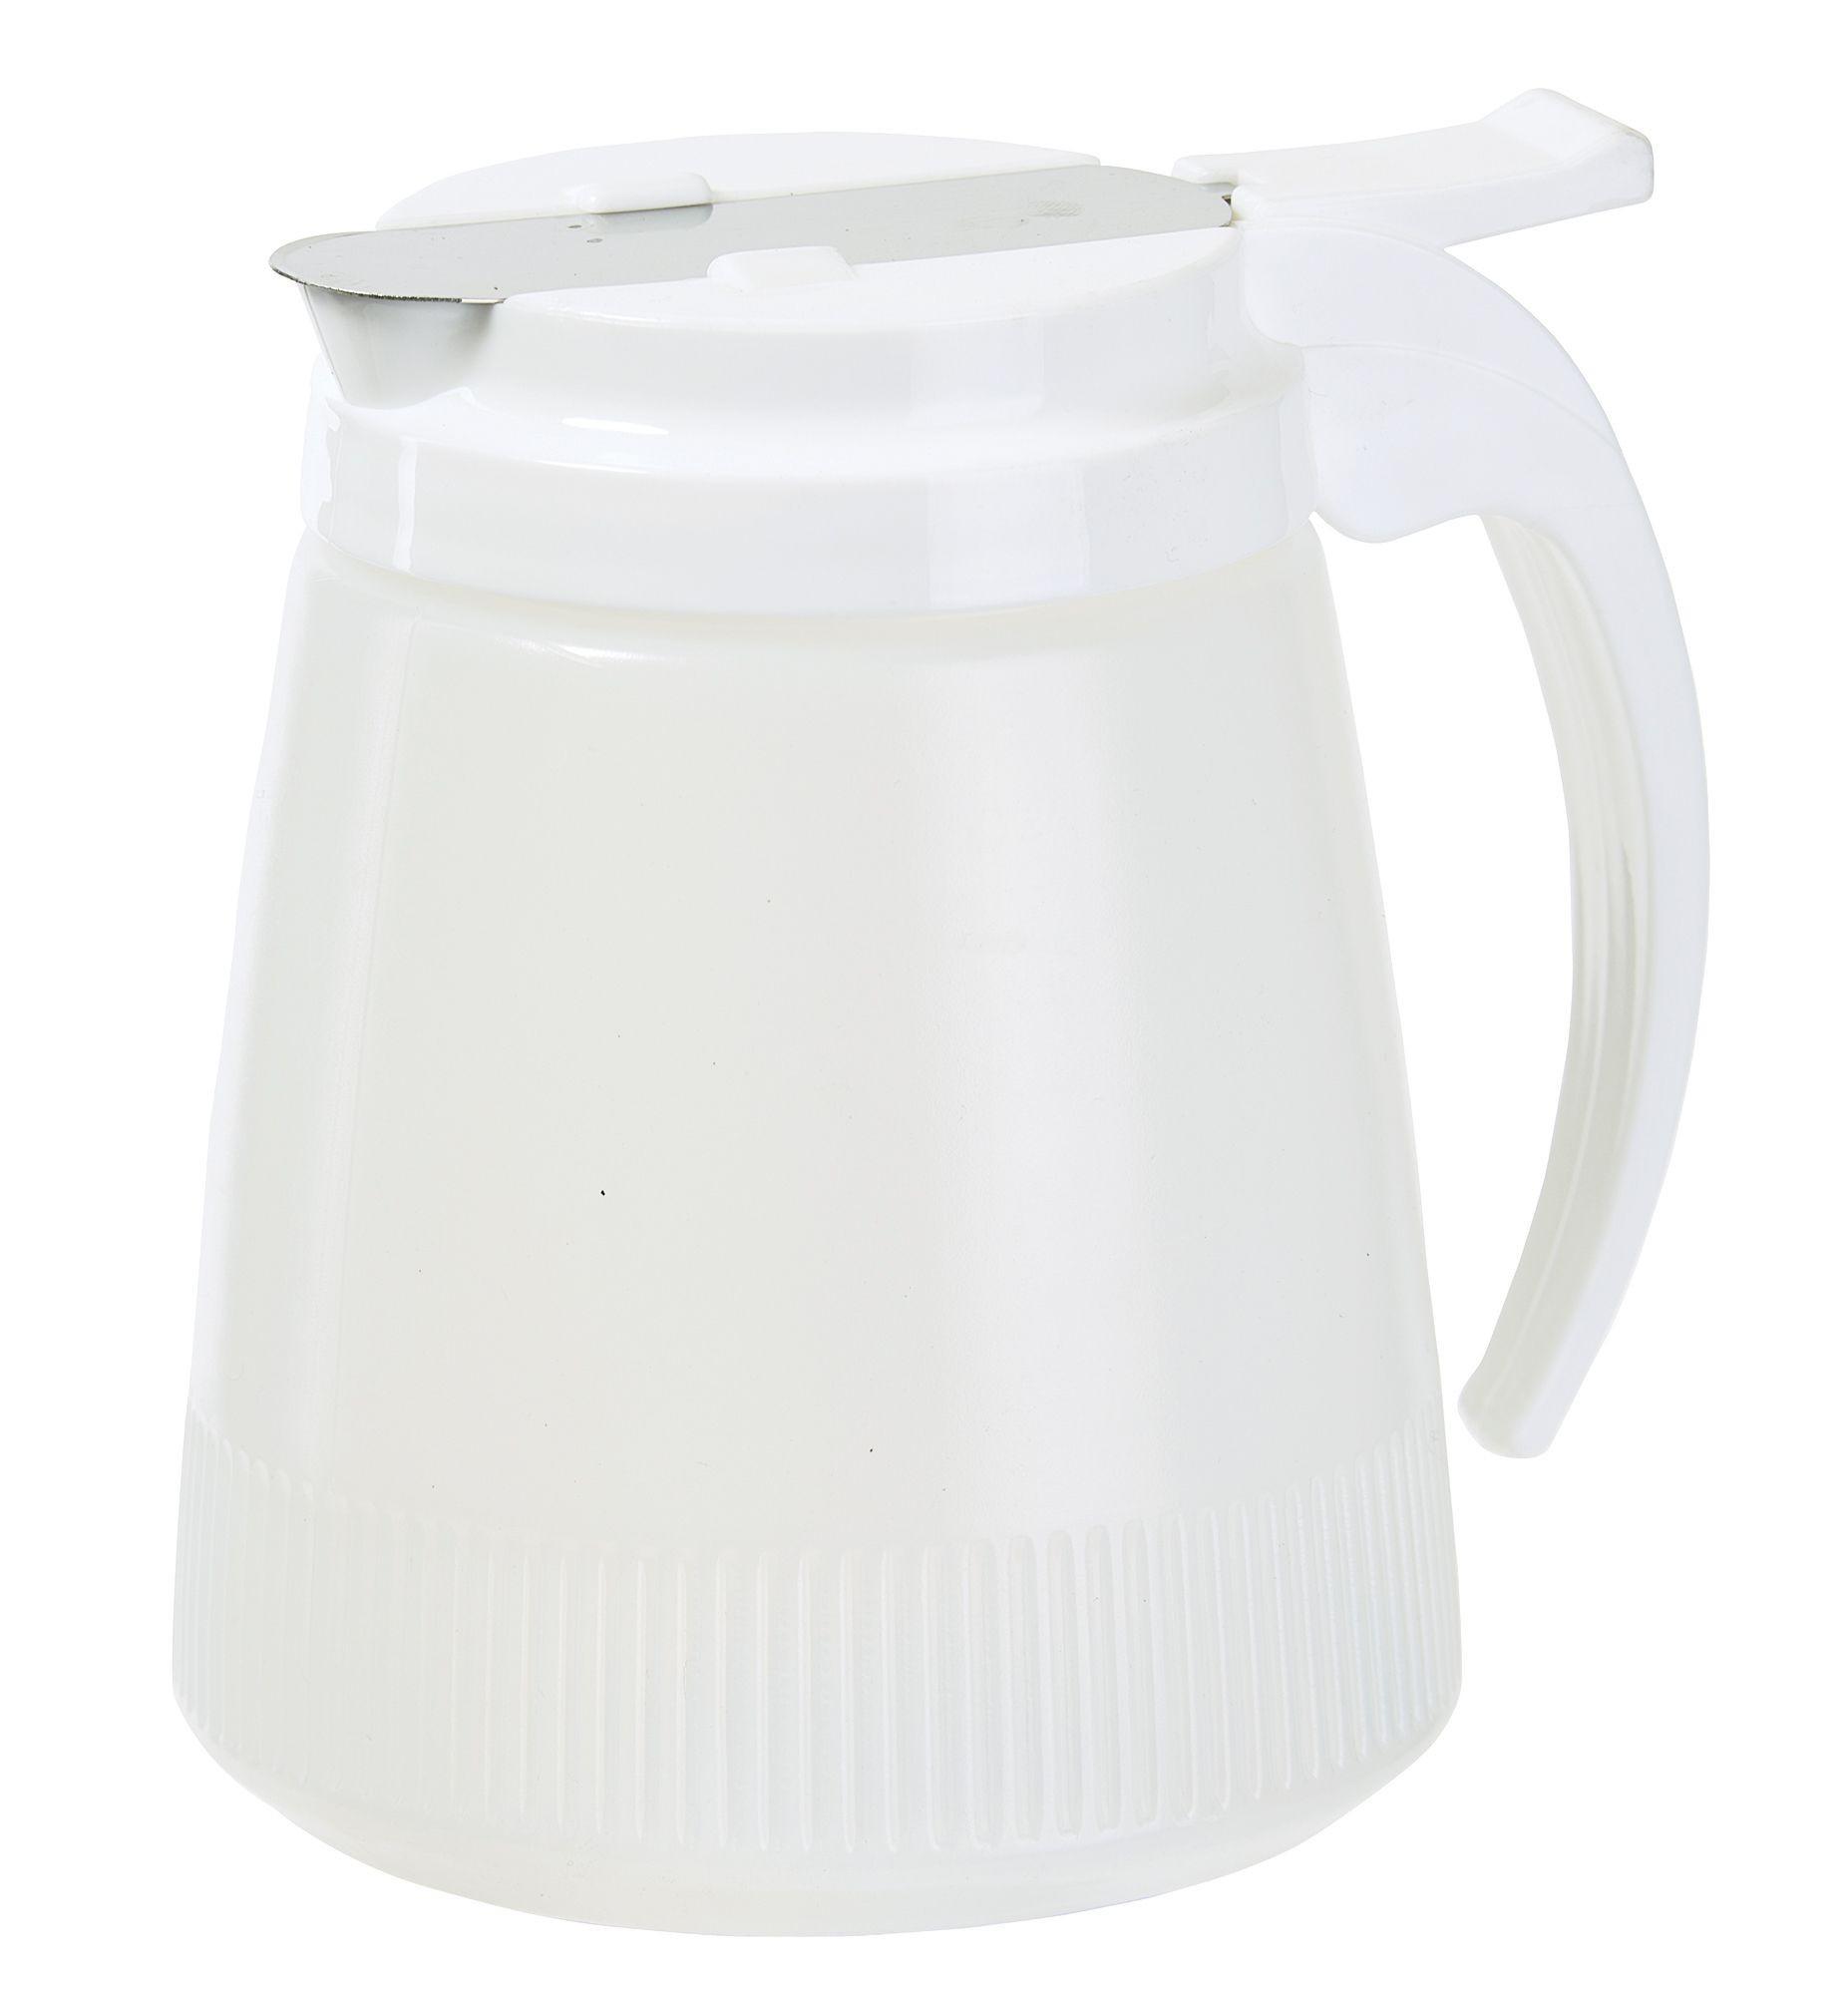 Winco PSUD-32 Plastic Syrup Dispenser 32 oz.